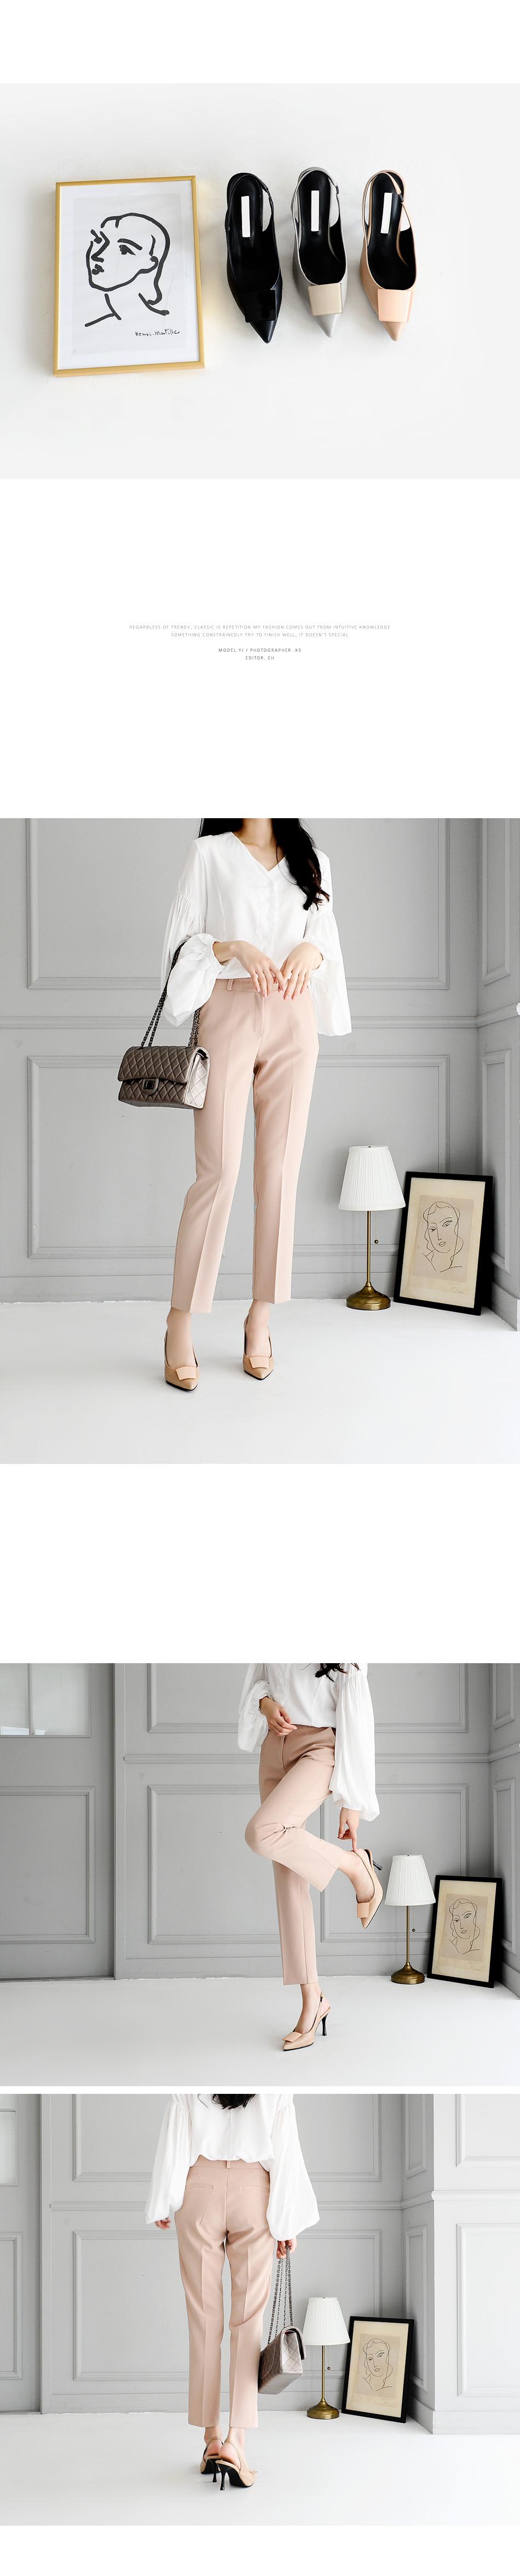 Rocky Slingback High Heels 8cm